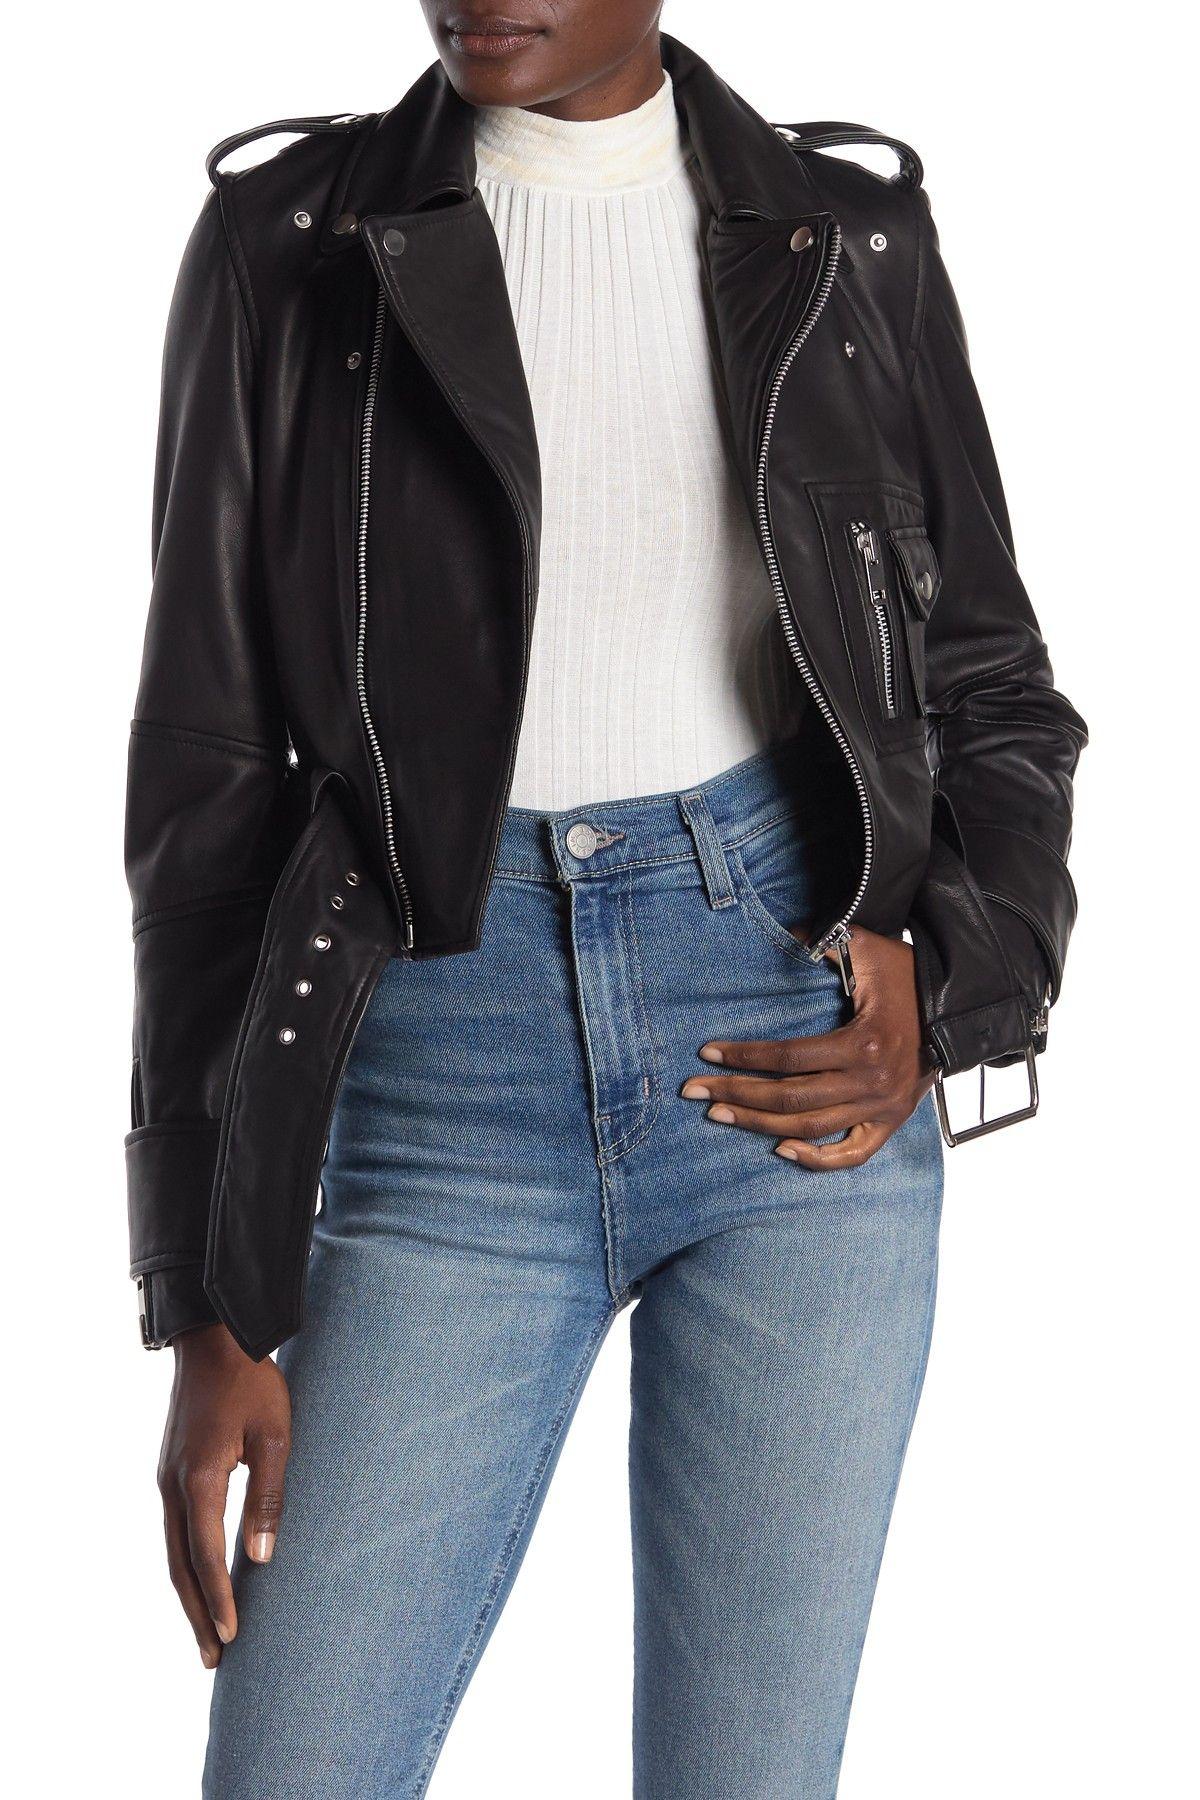 Walter Baker Annie Leather Moto Jacket HauteLook in